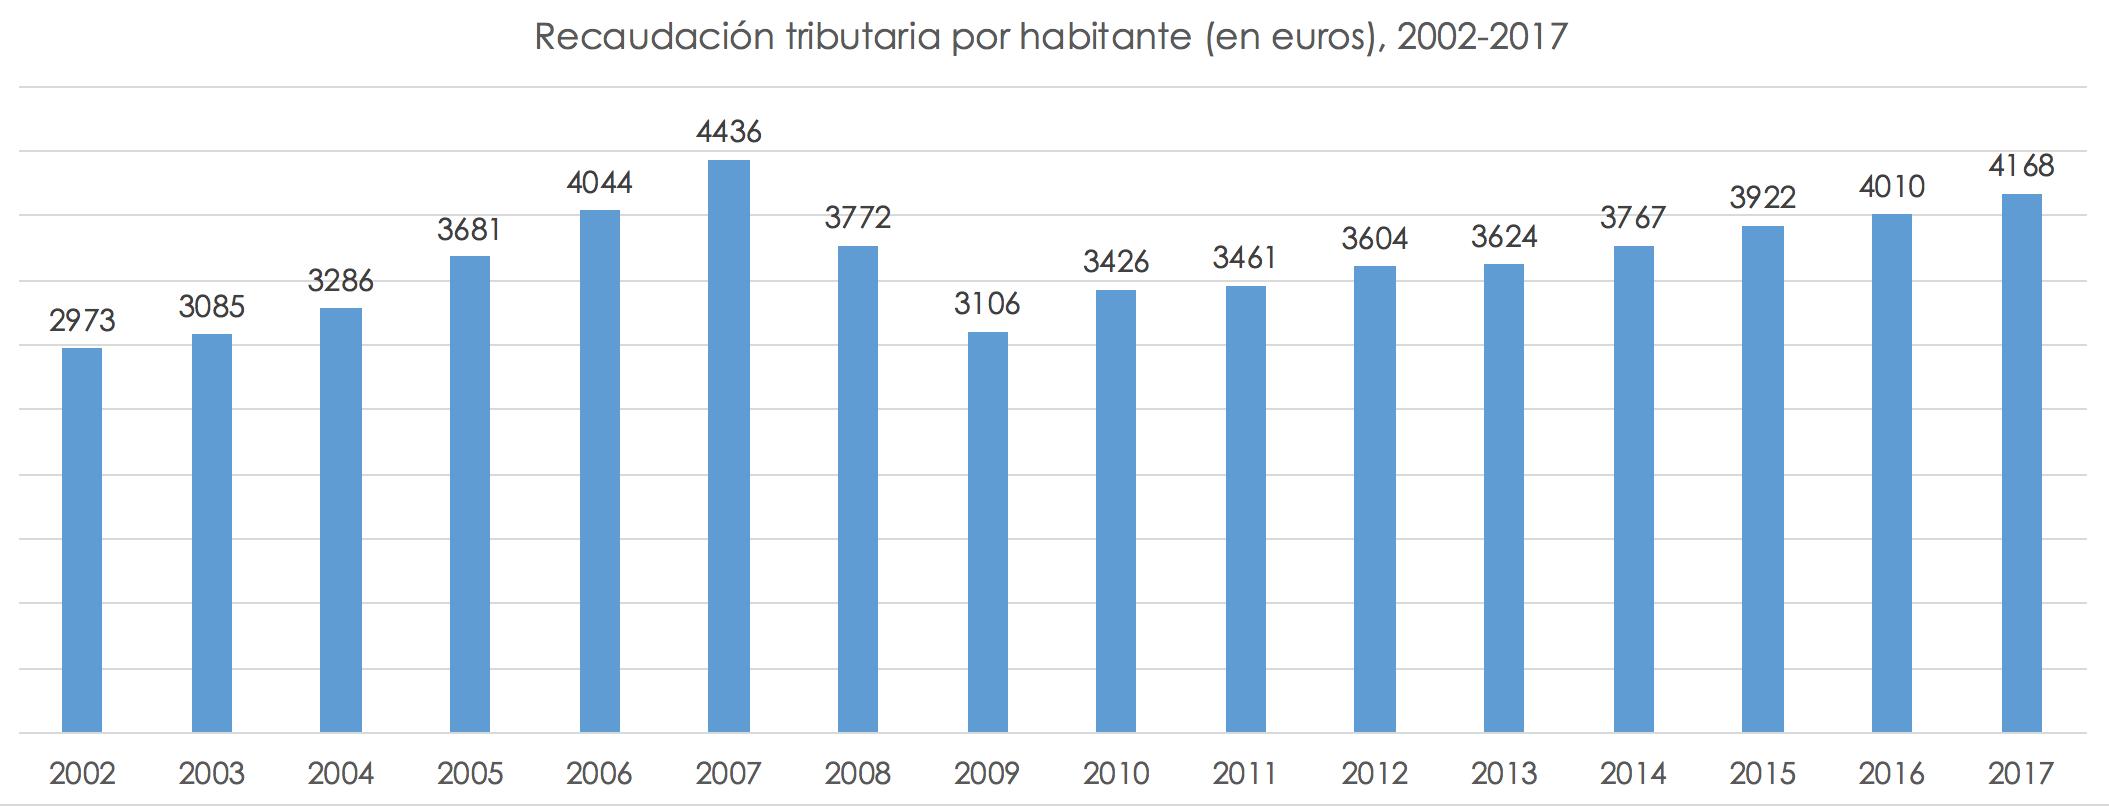 recaudacion-por-habitante-espana.png